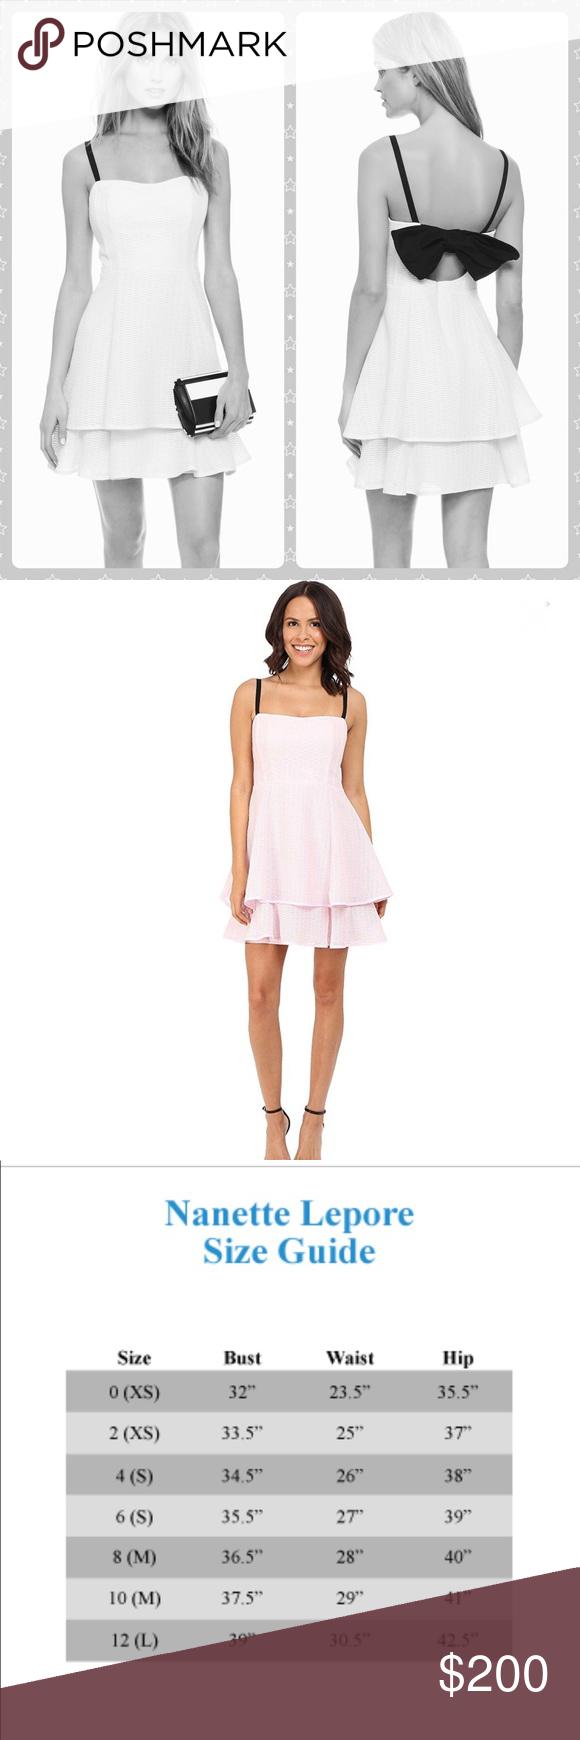 Nwt Nanette Lepore A Line Tier Party Dress W Bow Clothes Design Nanette Lepore Dress Nanette Lepore